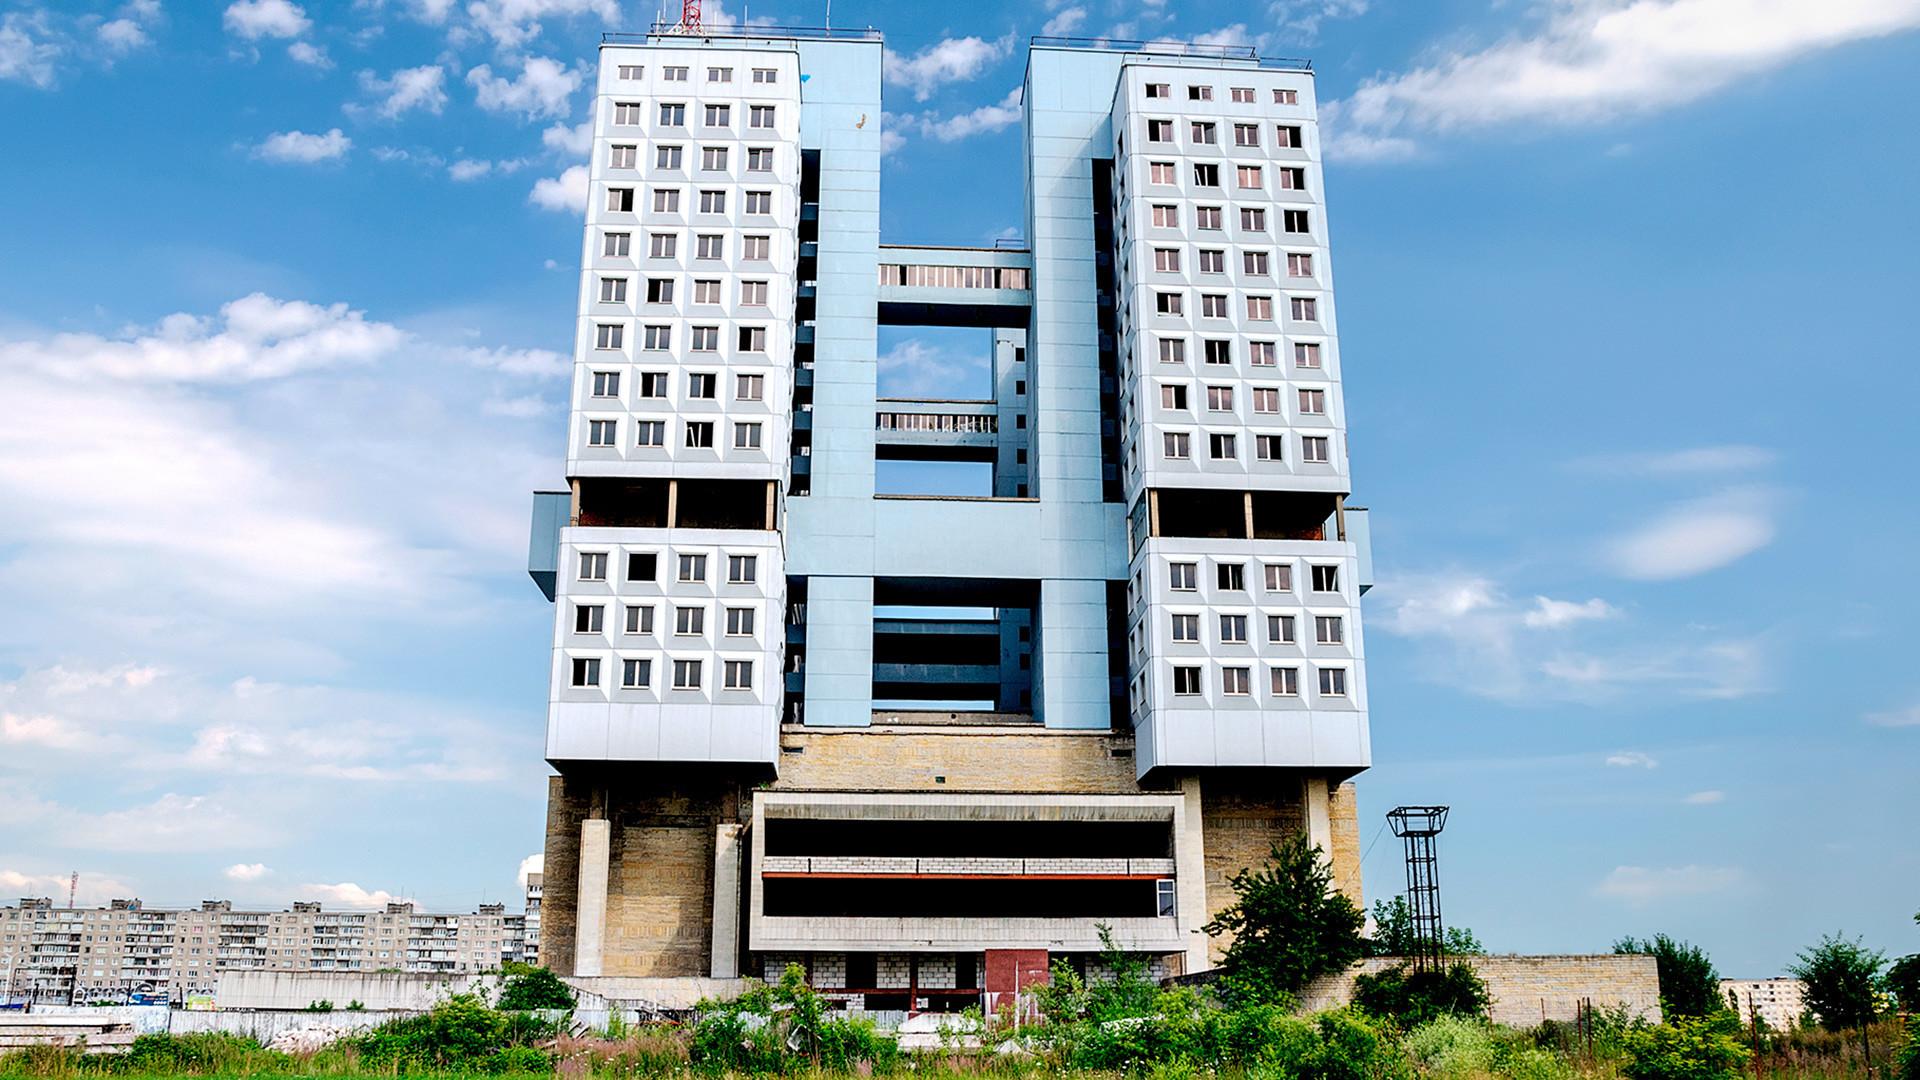 Rumah Soviet.